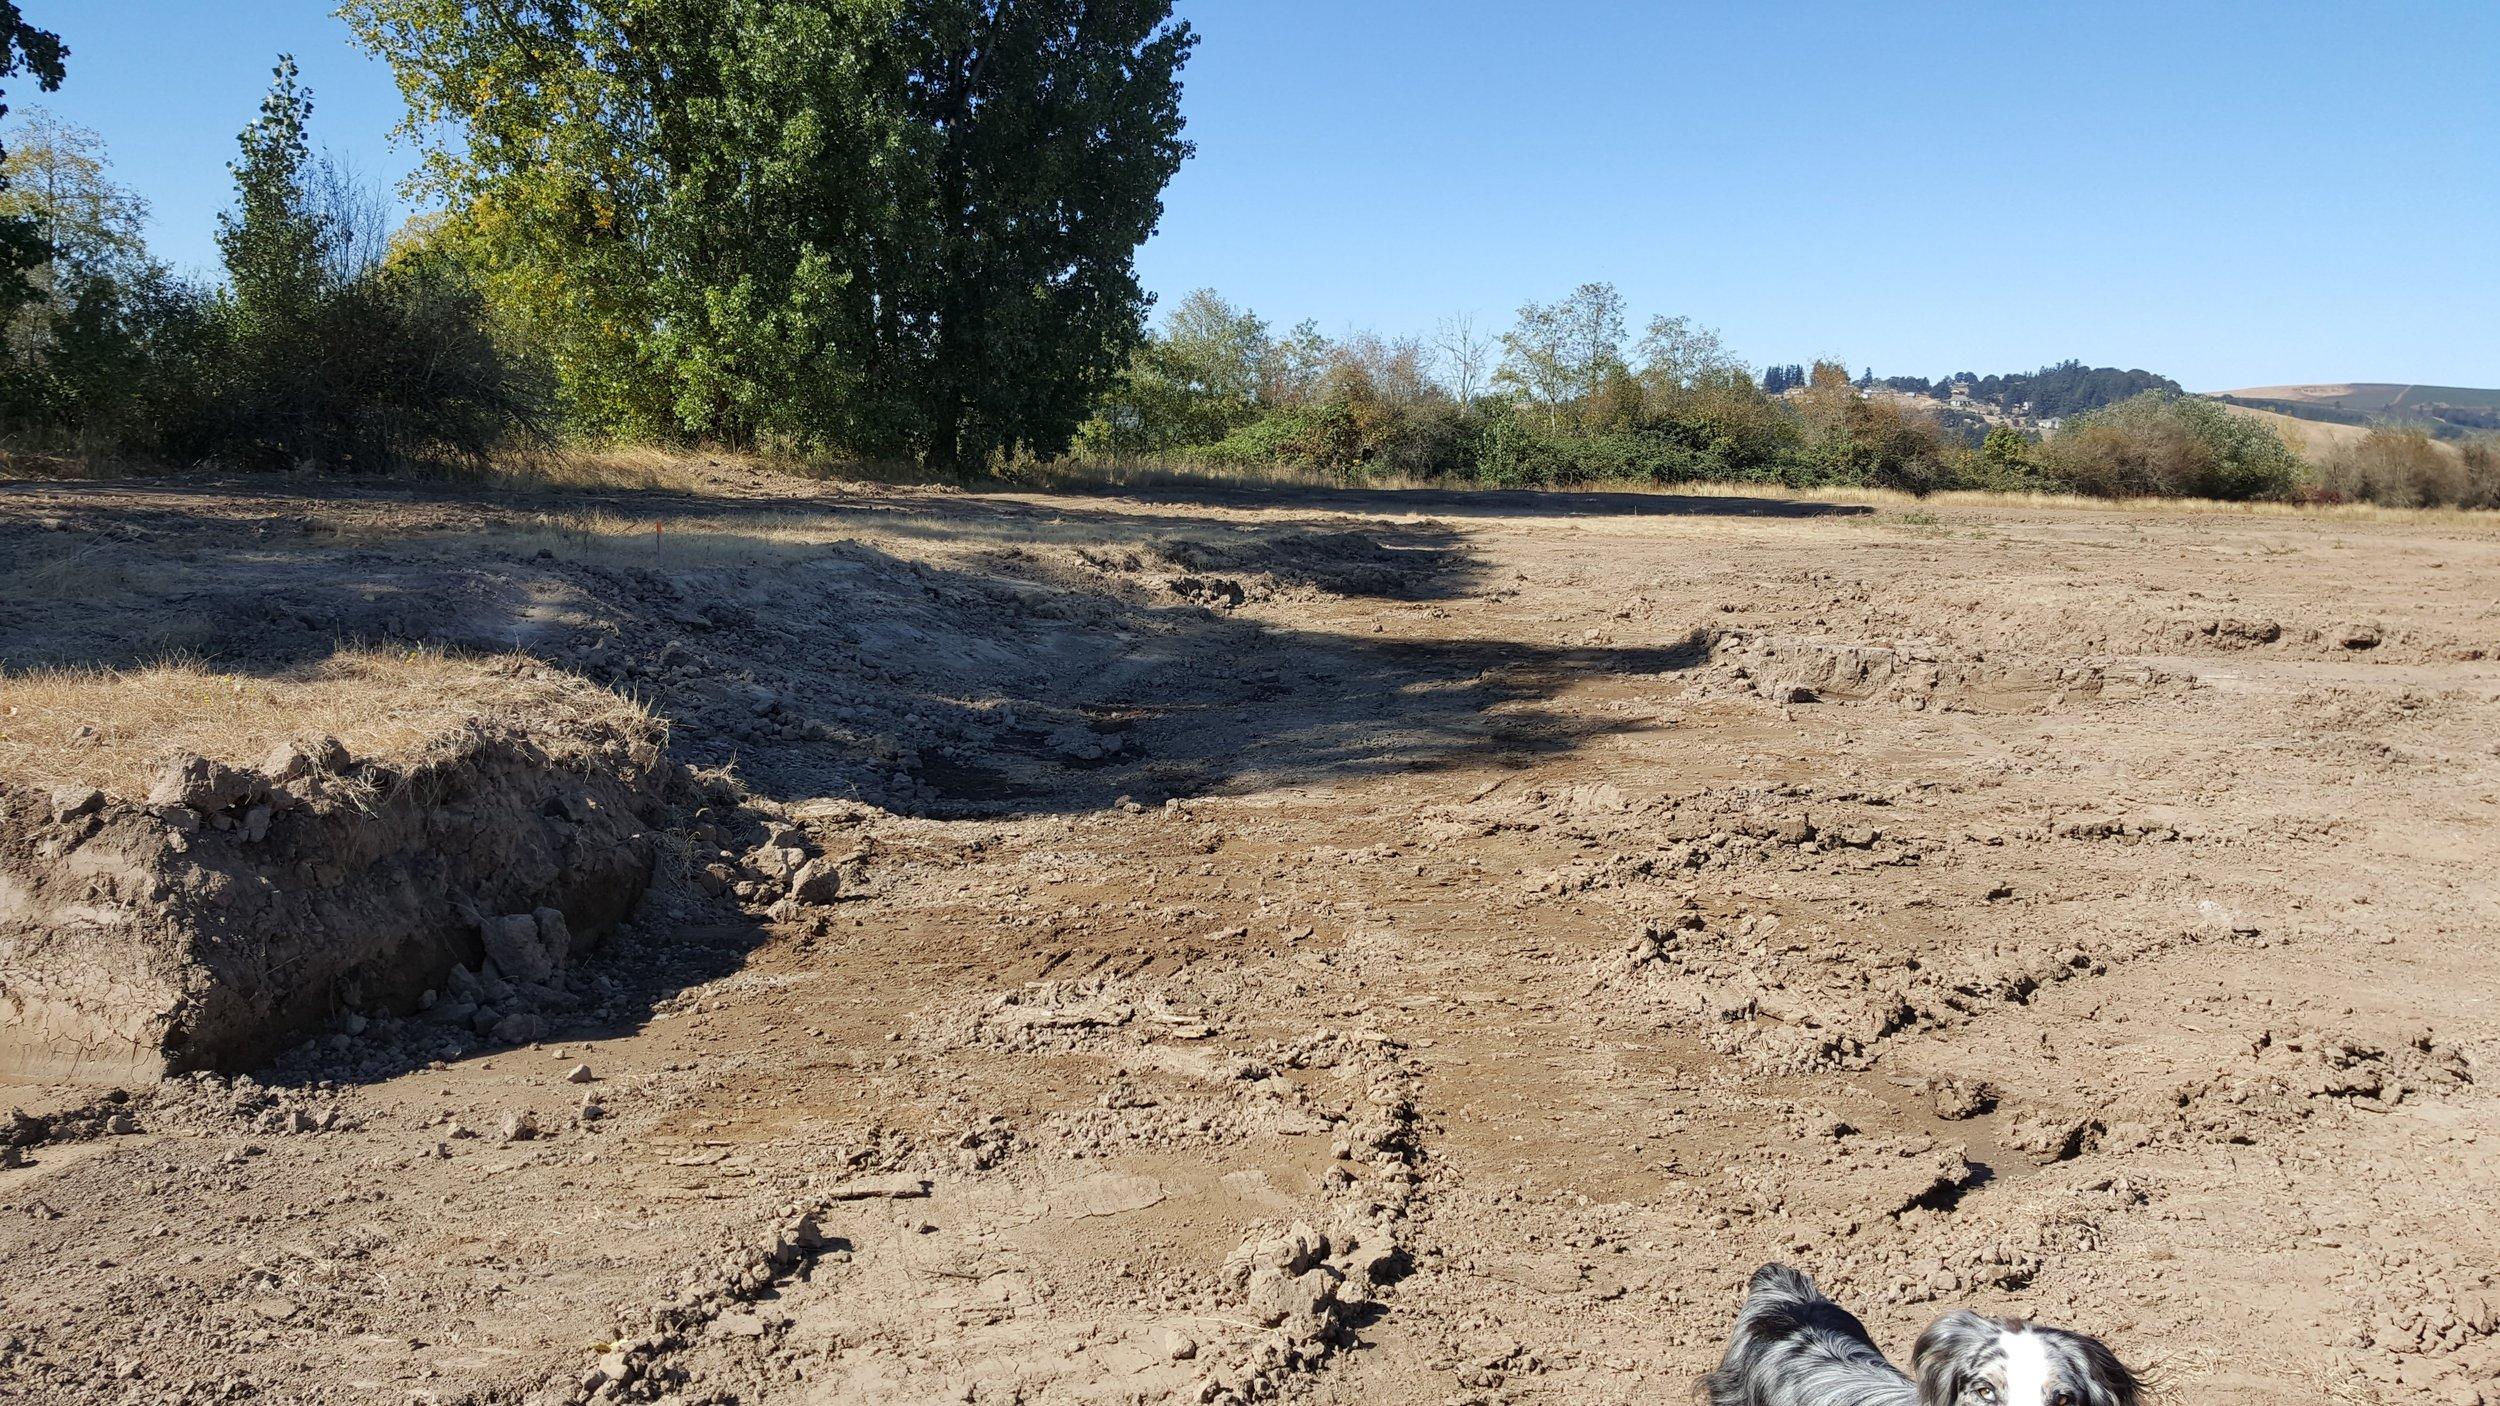 30' x 30' pond near riparian vegetation at Santiam Valley Ranch.